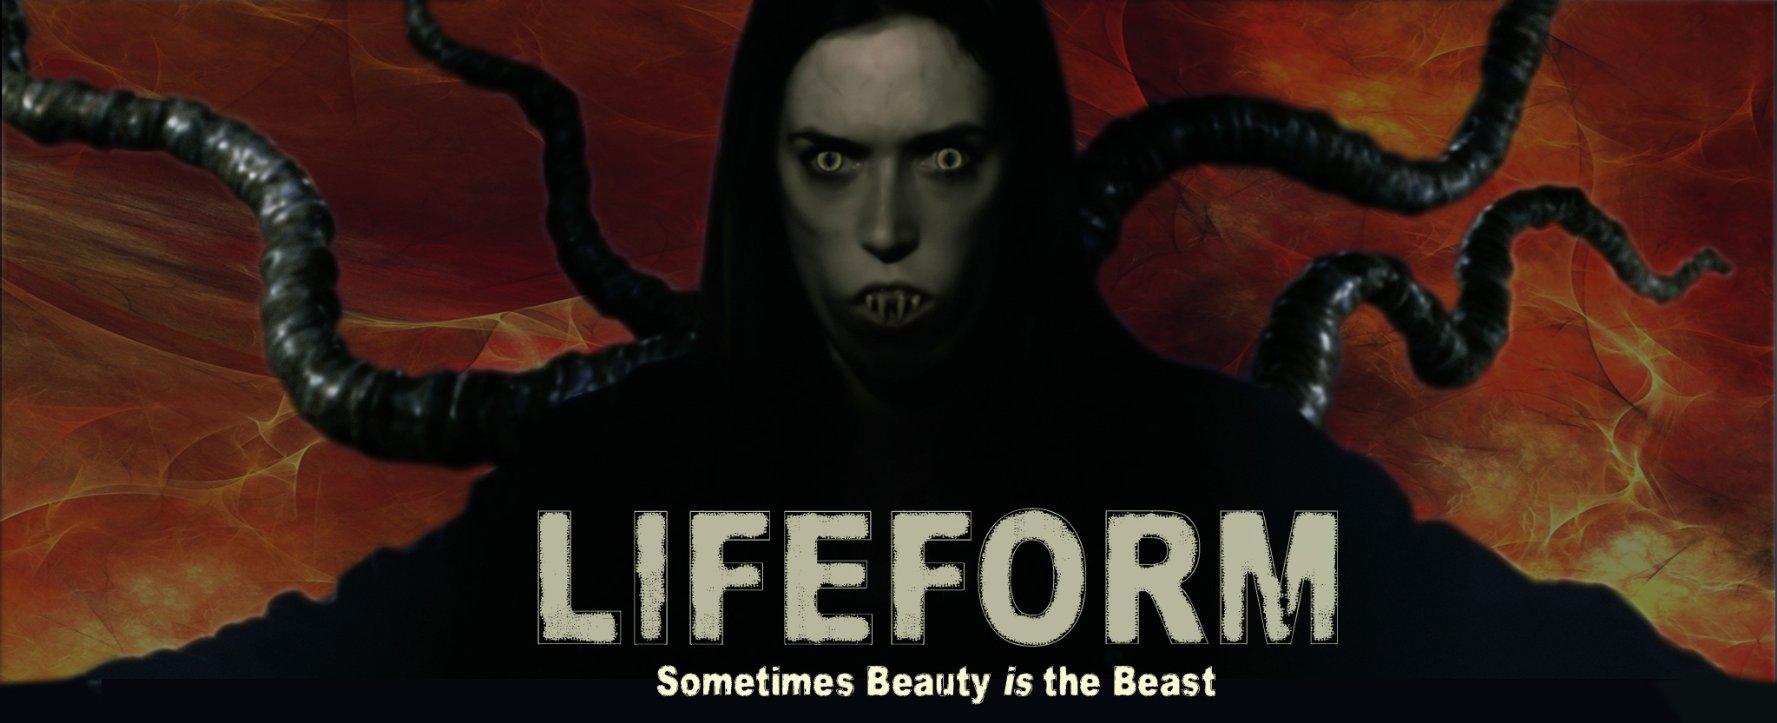 Lifeform-2017-Beauty-is-the-Beast-postermrhorrorpedia